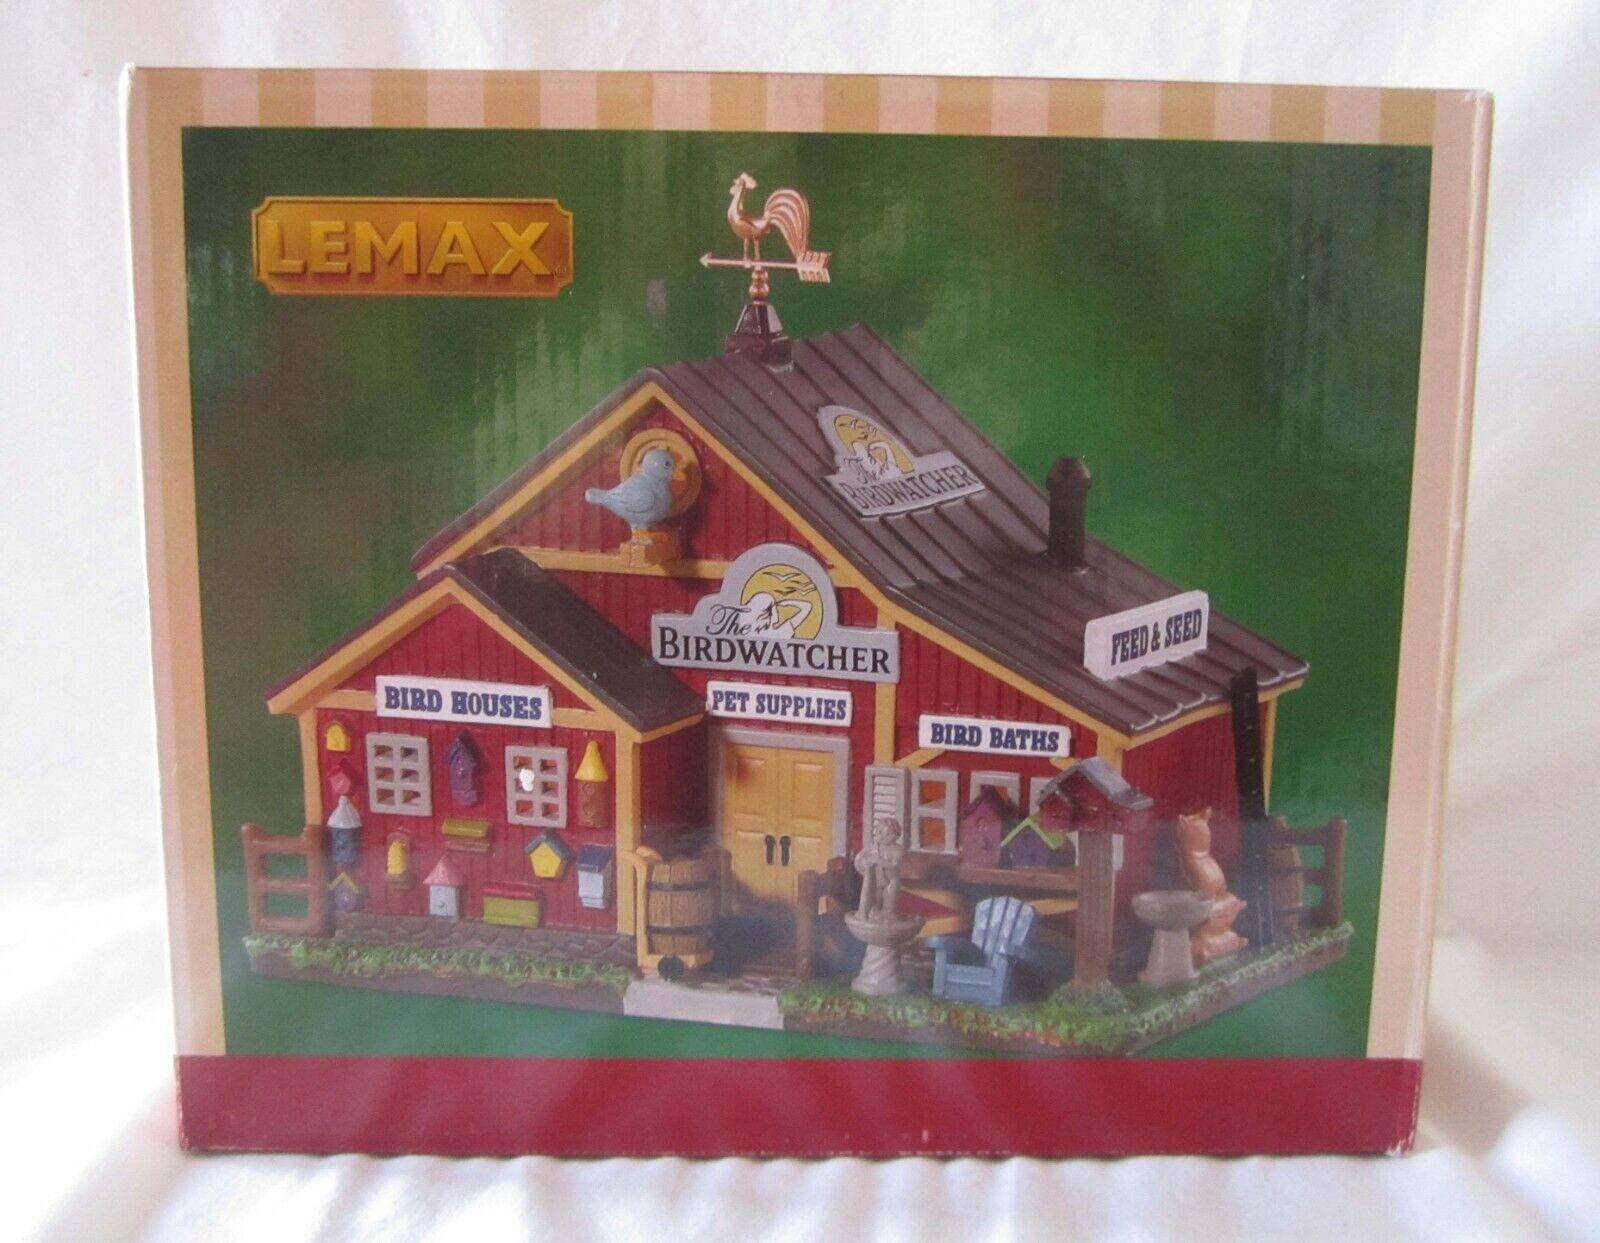 Lemax Lemax Lemax Christmas Village THE BIRDWATCHER   85367  @2018 New dd081e